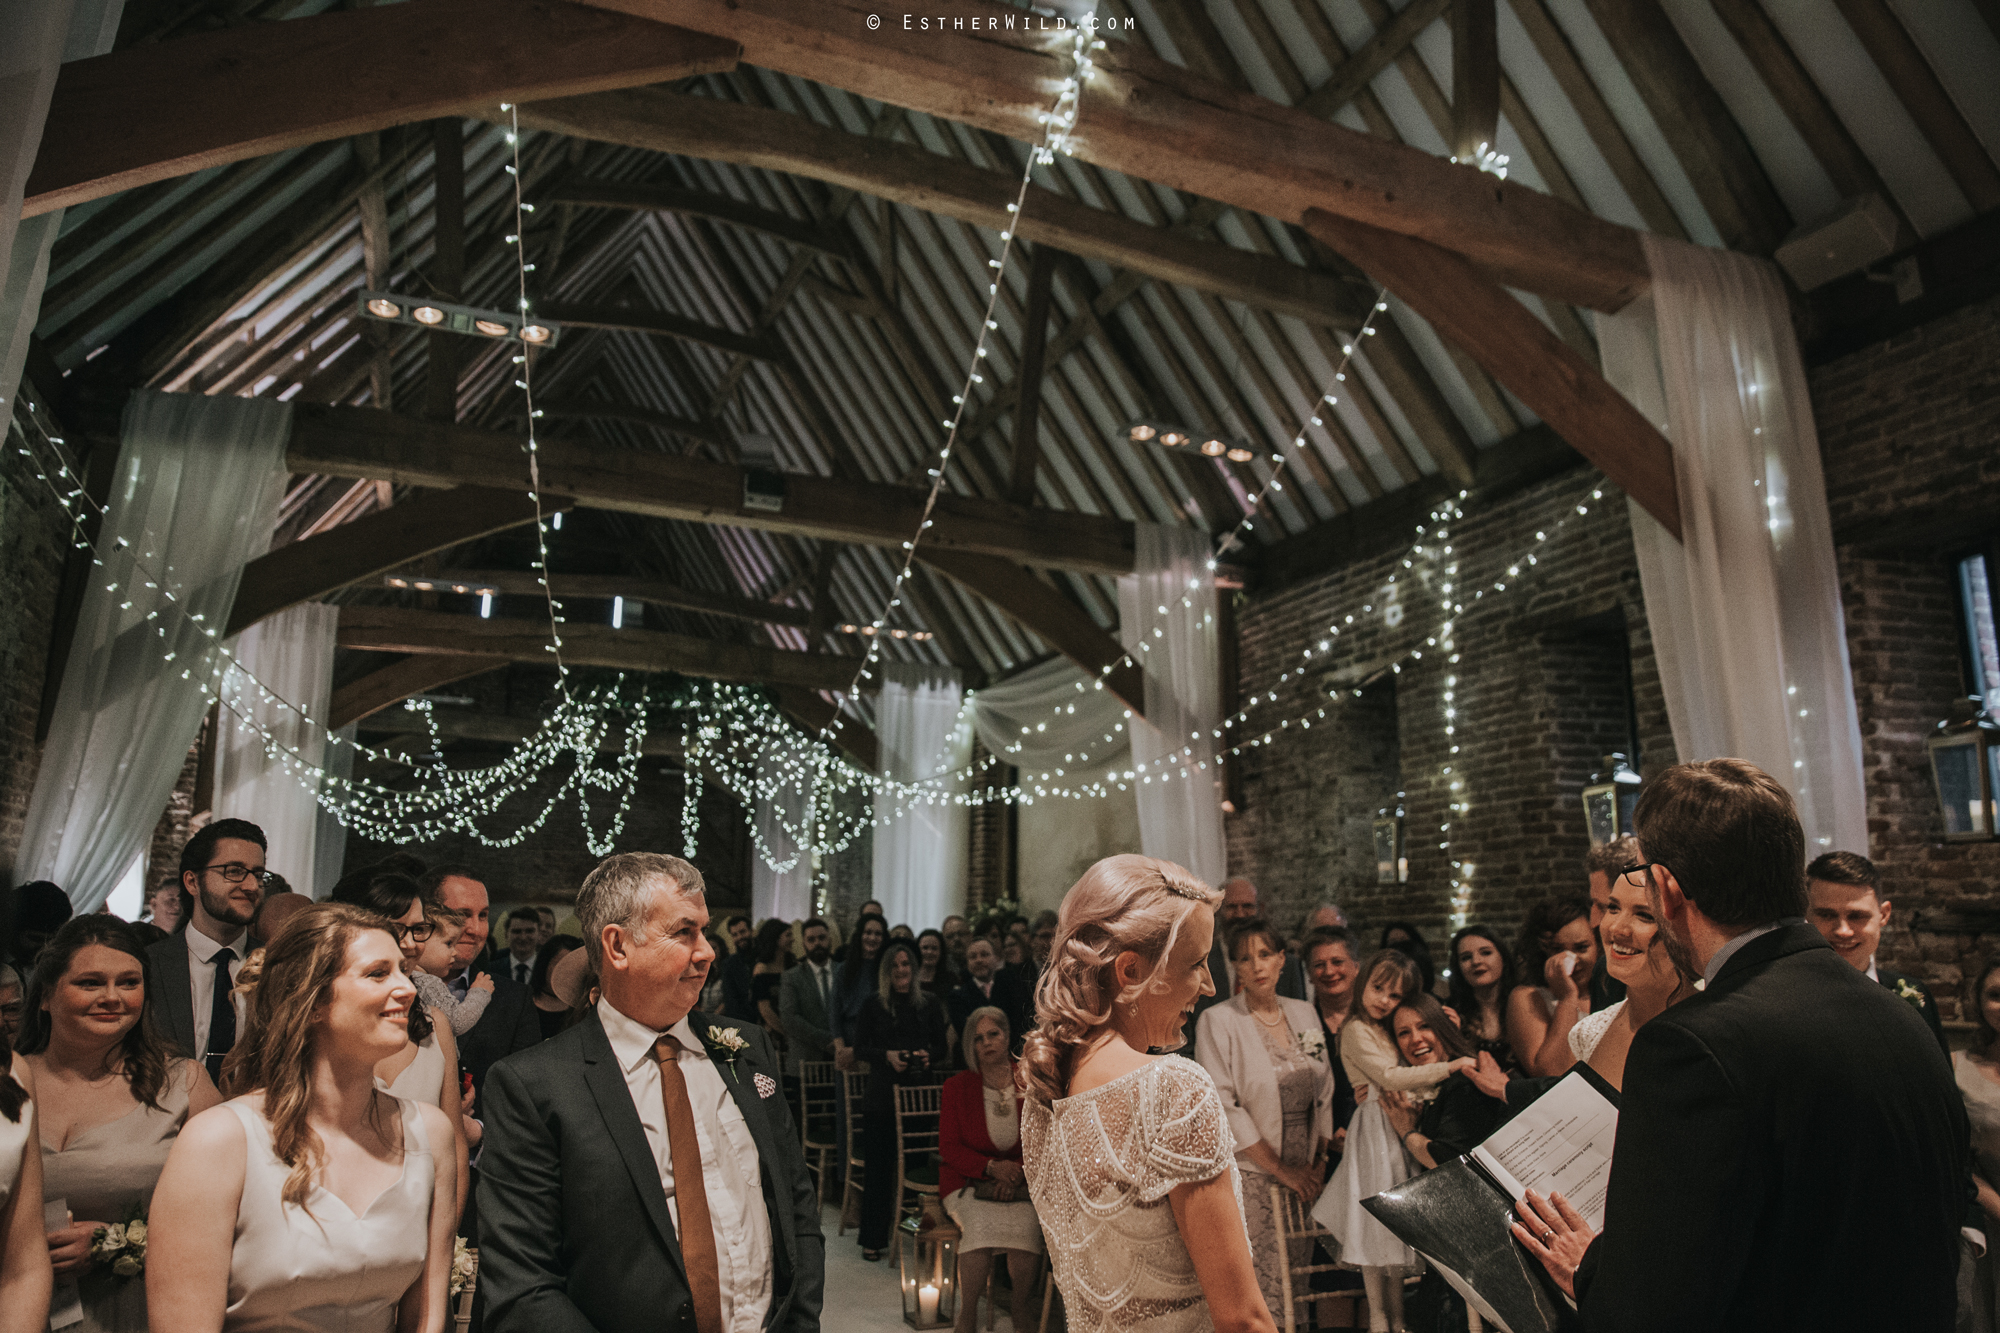 Elms_Barn_Weddings_Suffolk_Photographer_Copyright_Esther_Wild_IMG_1163.jpg